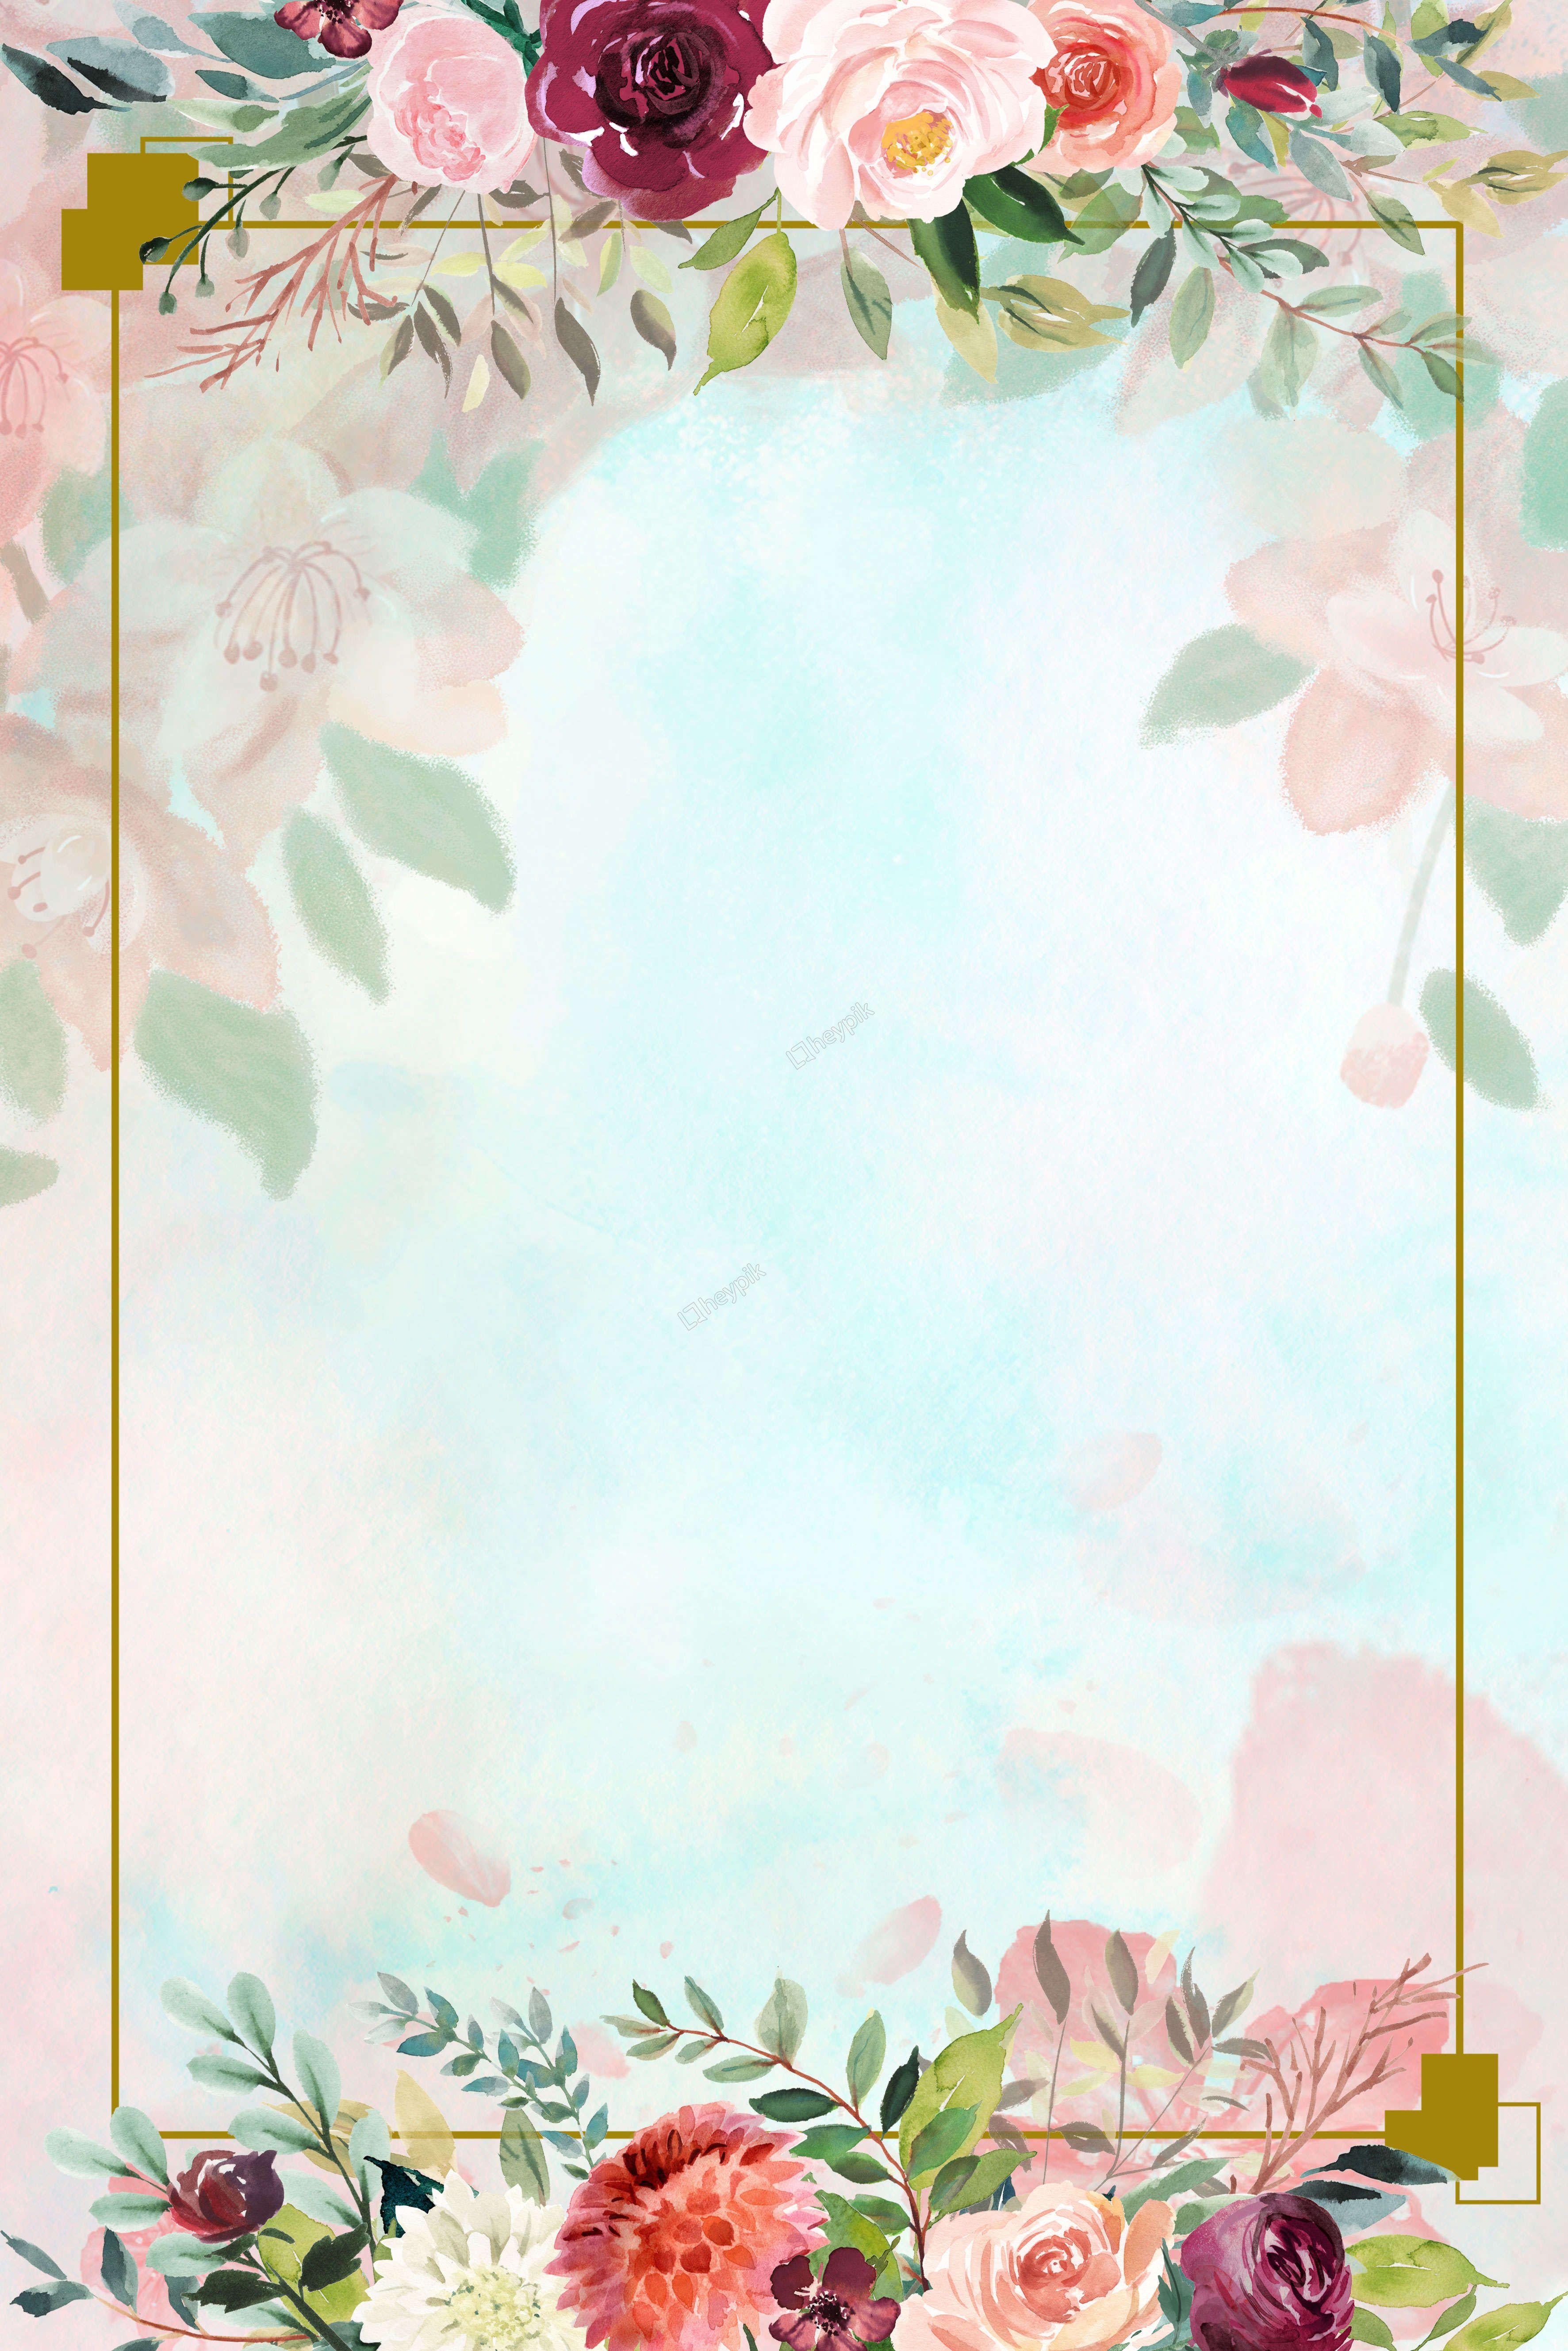 Floral border fresh background poster creative